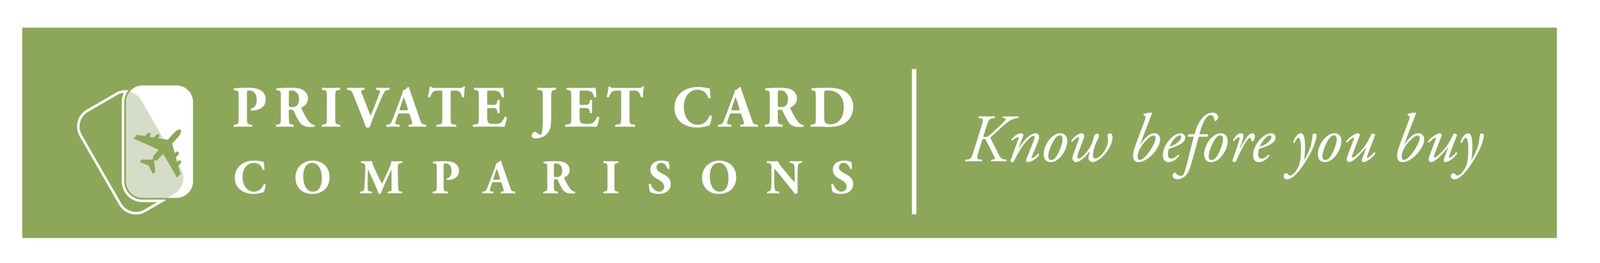 PrivateJetCardComparisons Provides Innovative Insight